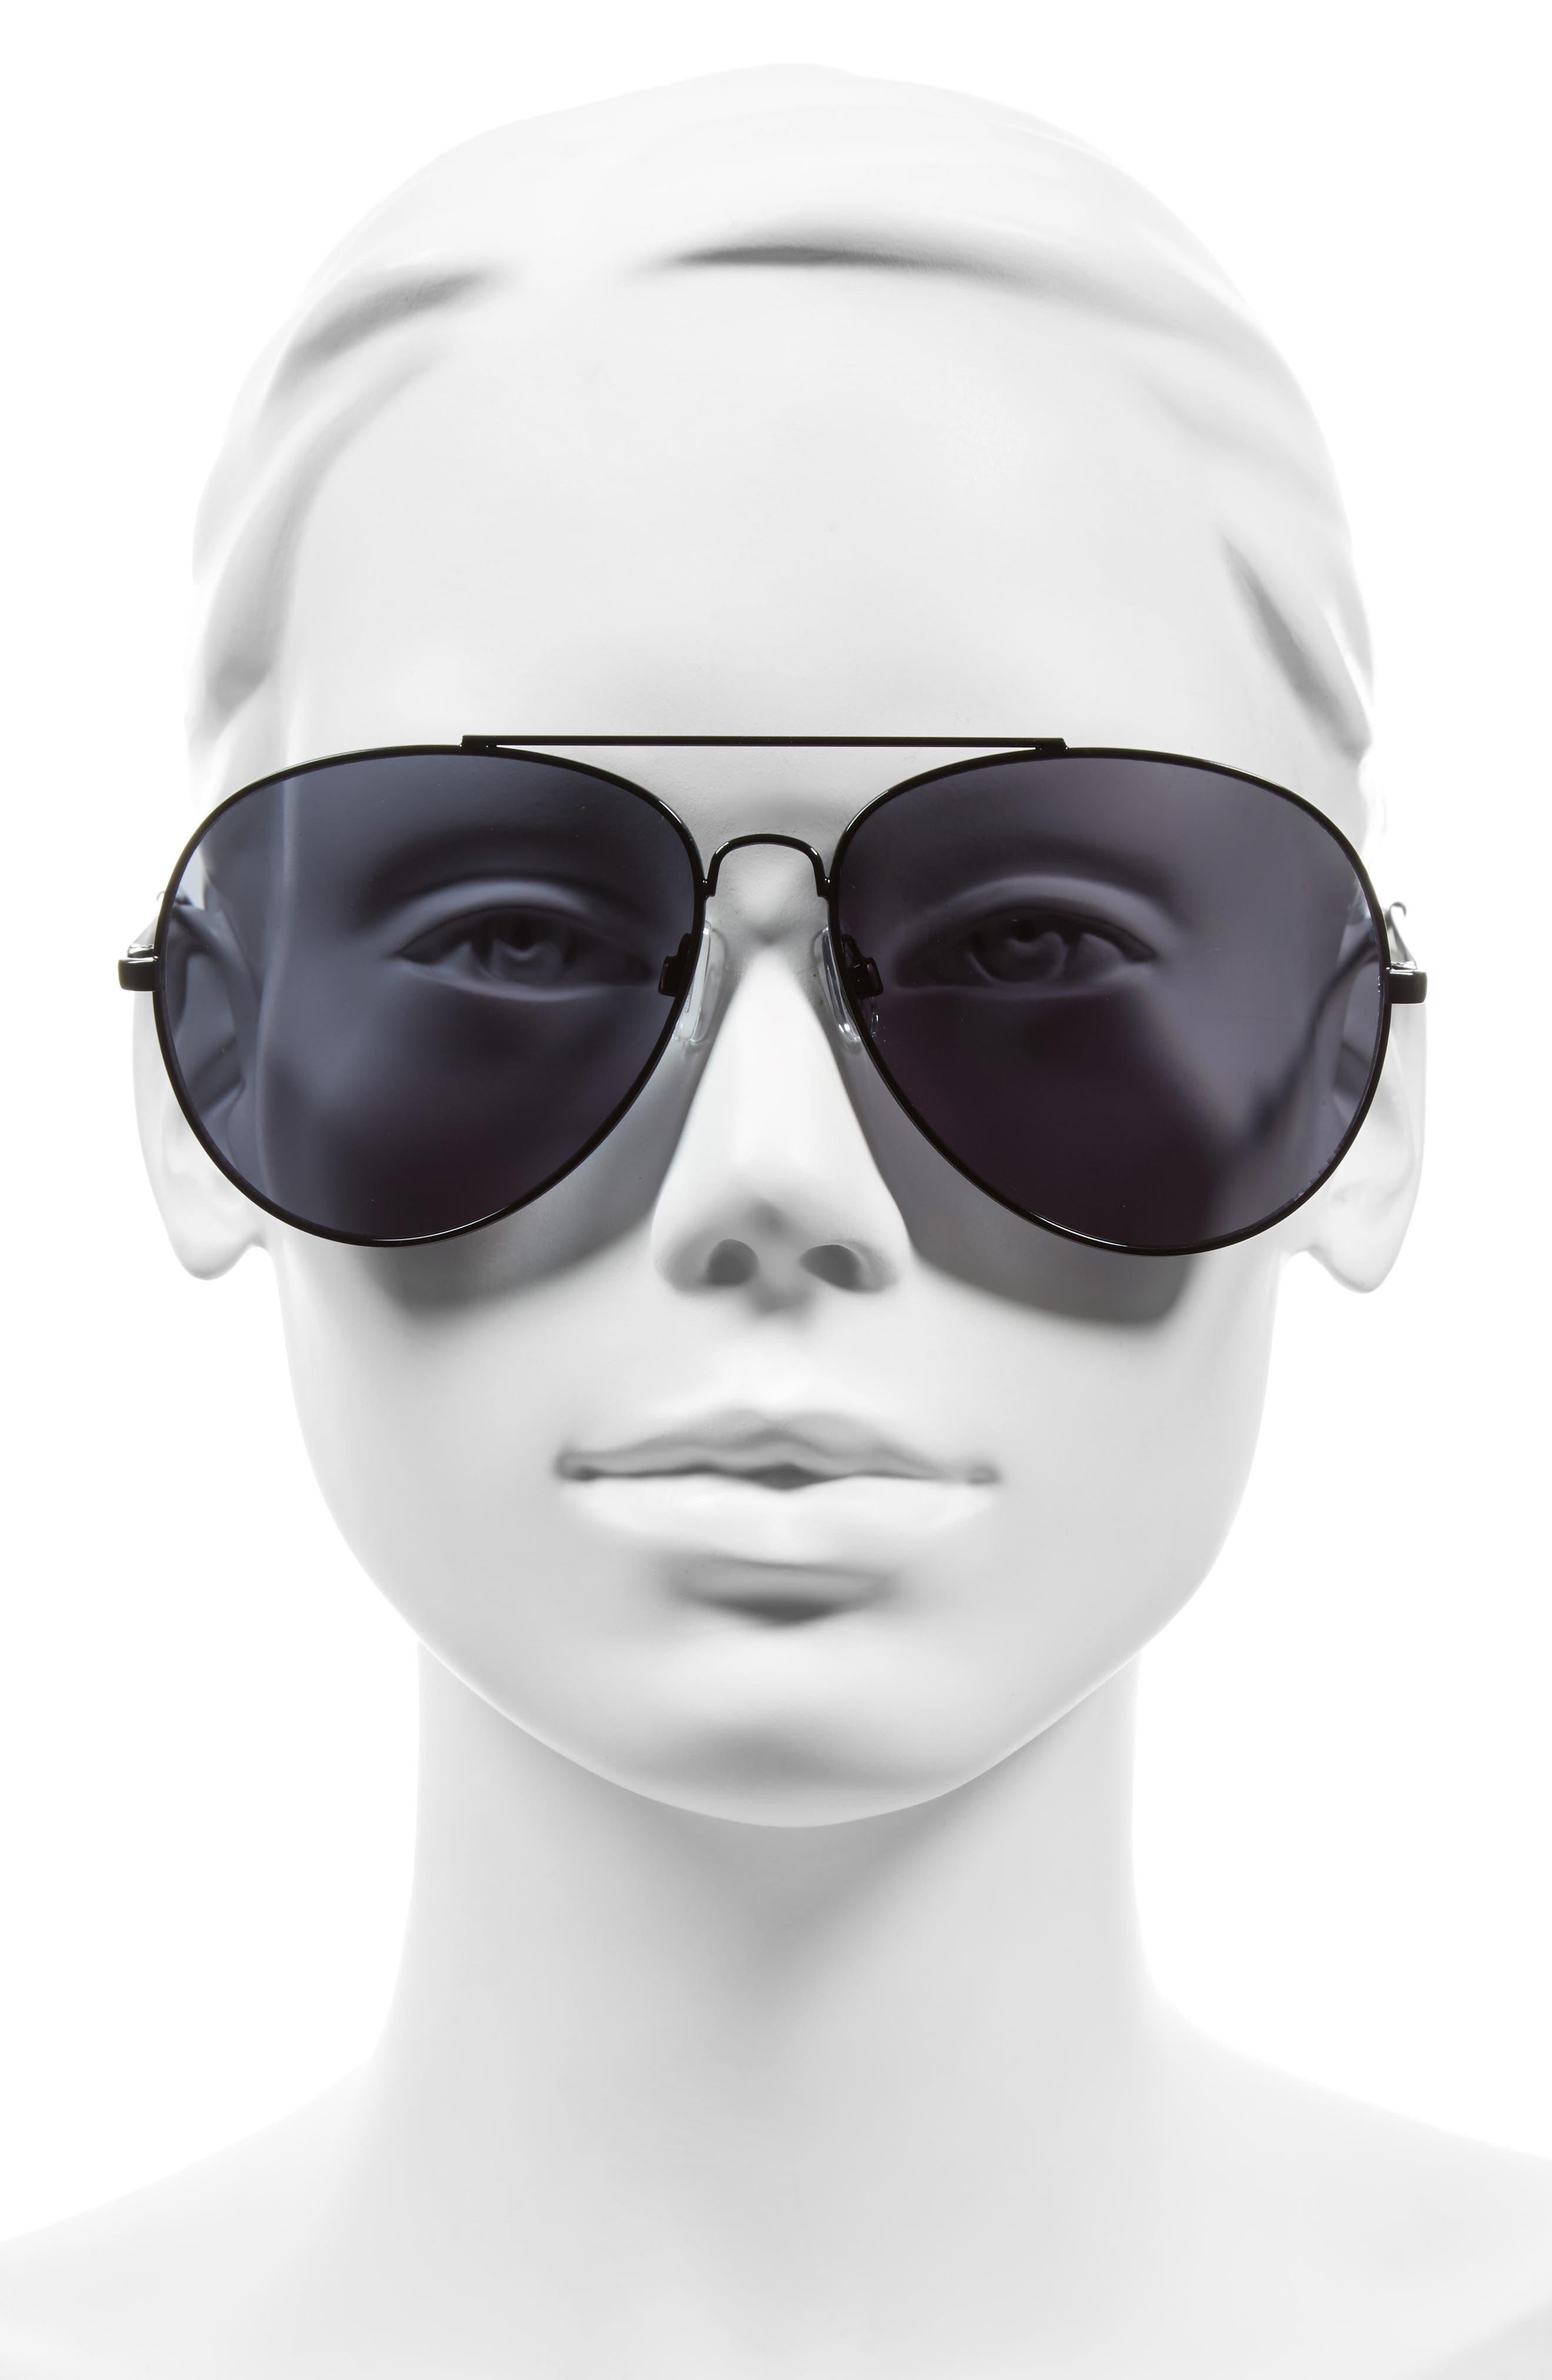 65mm Oversize Aviator Sunglasses,                             Alternate thumbnail 3, color,                             001